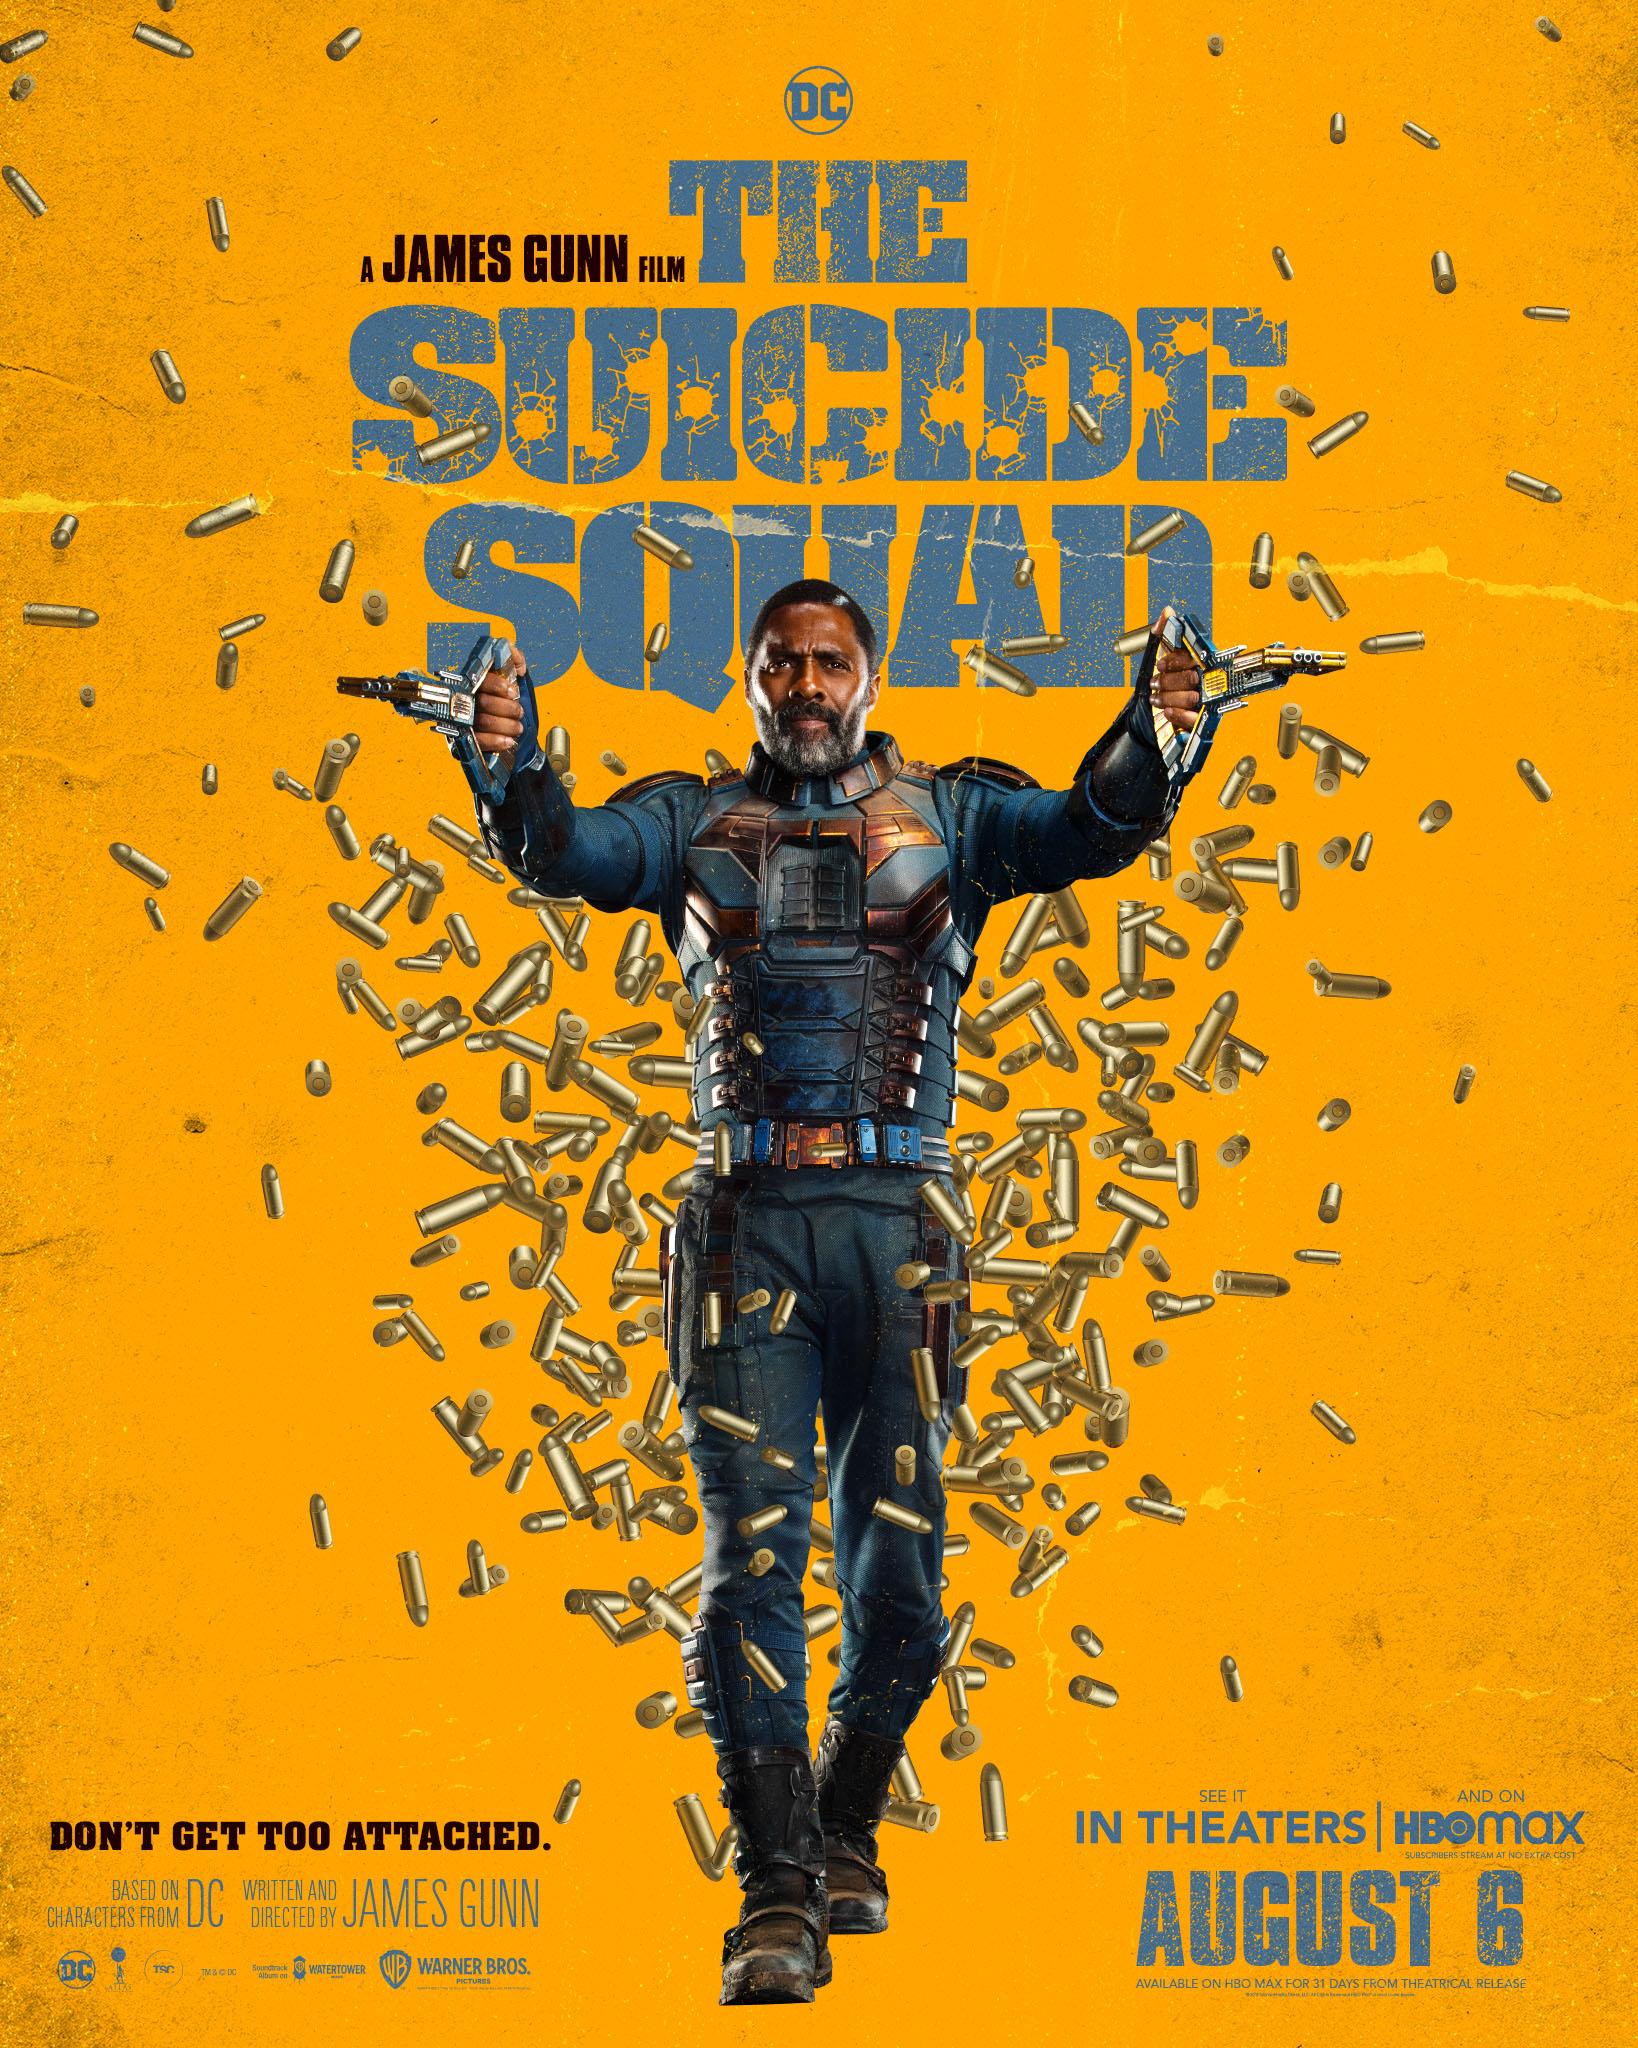 New Movie: The Suicide Squad Starring Idris Elba, Margot Robbie